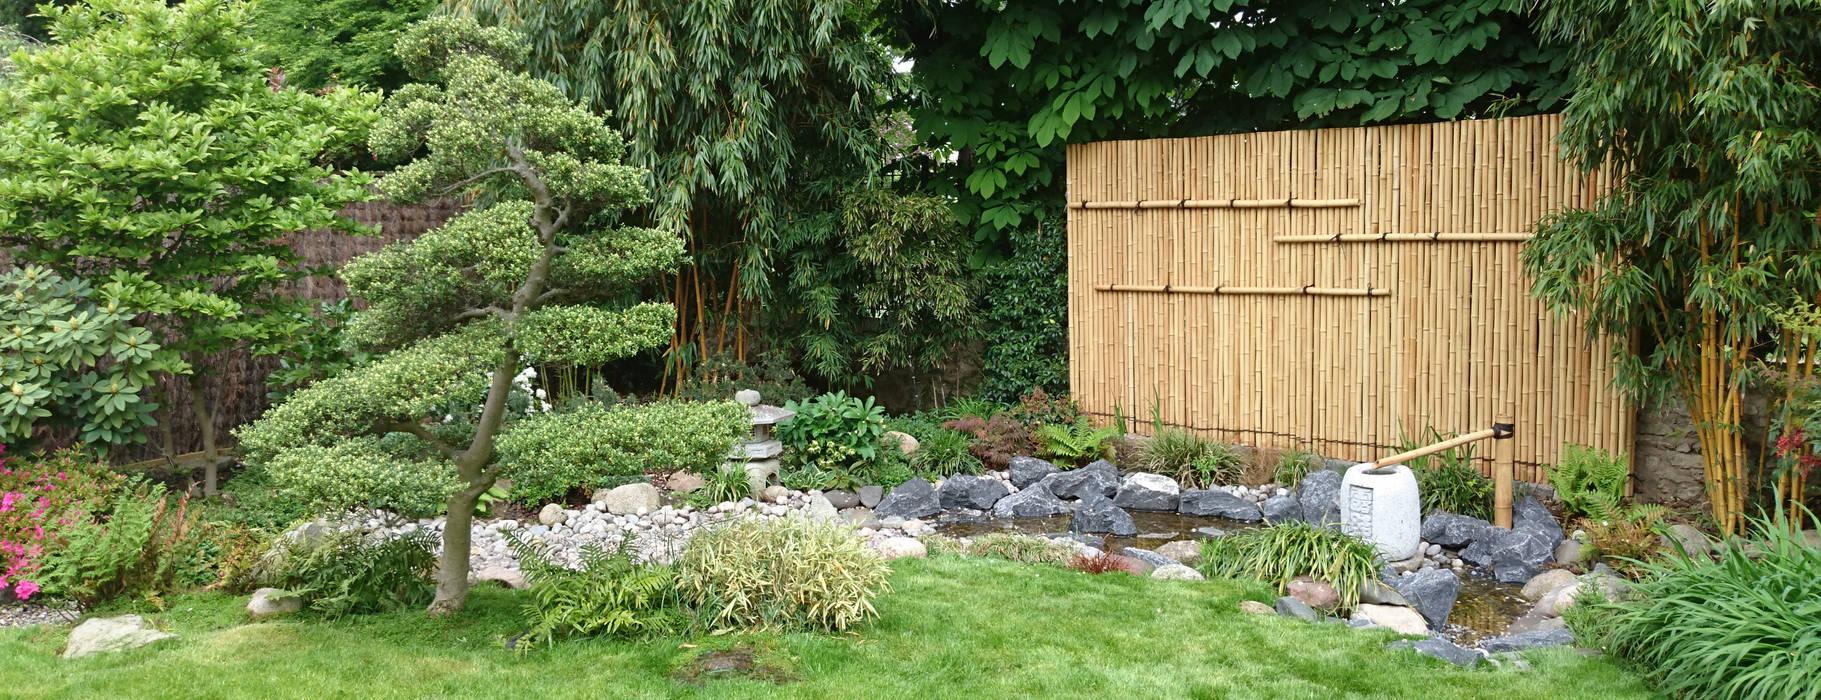 Jardin japonais bassin jardin de style par jardin japonais homify - Bassin jardin japonais ...